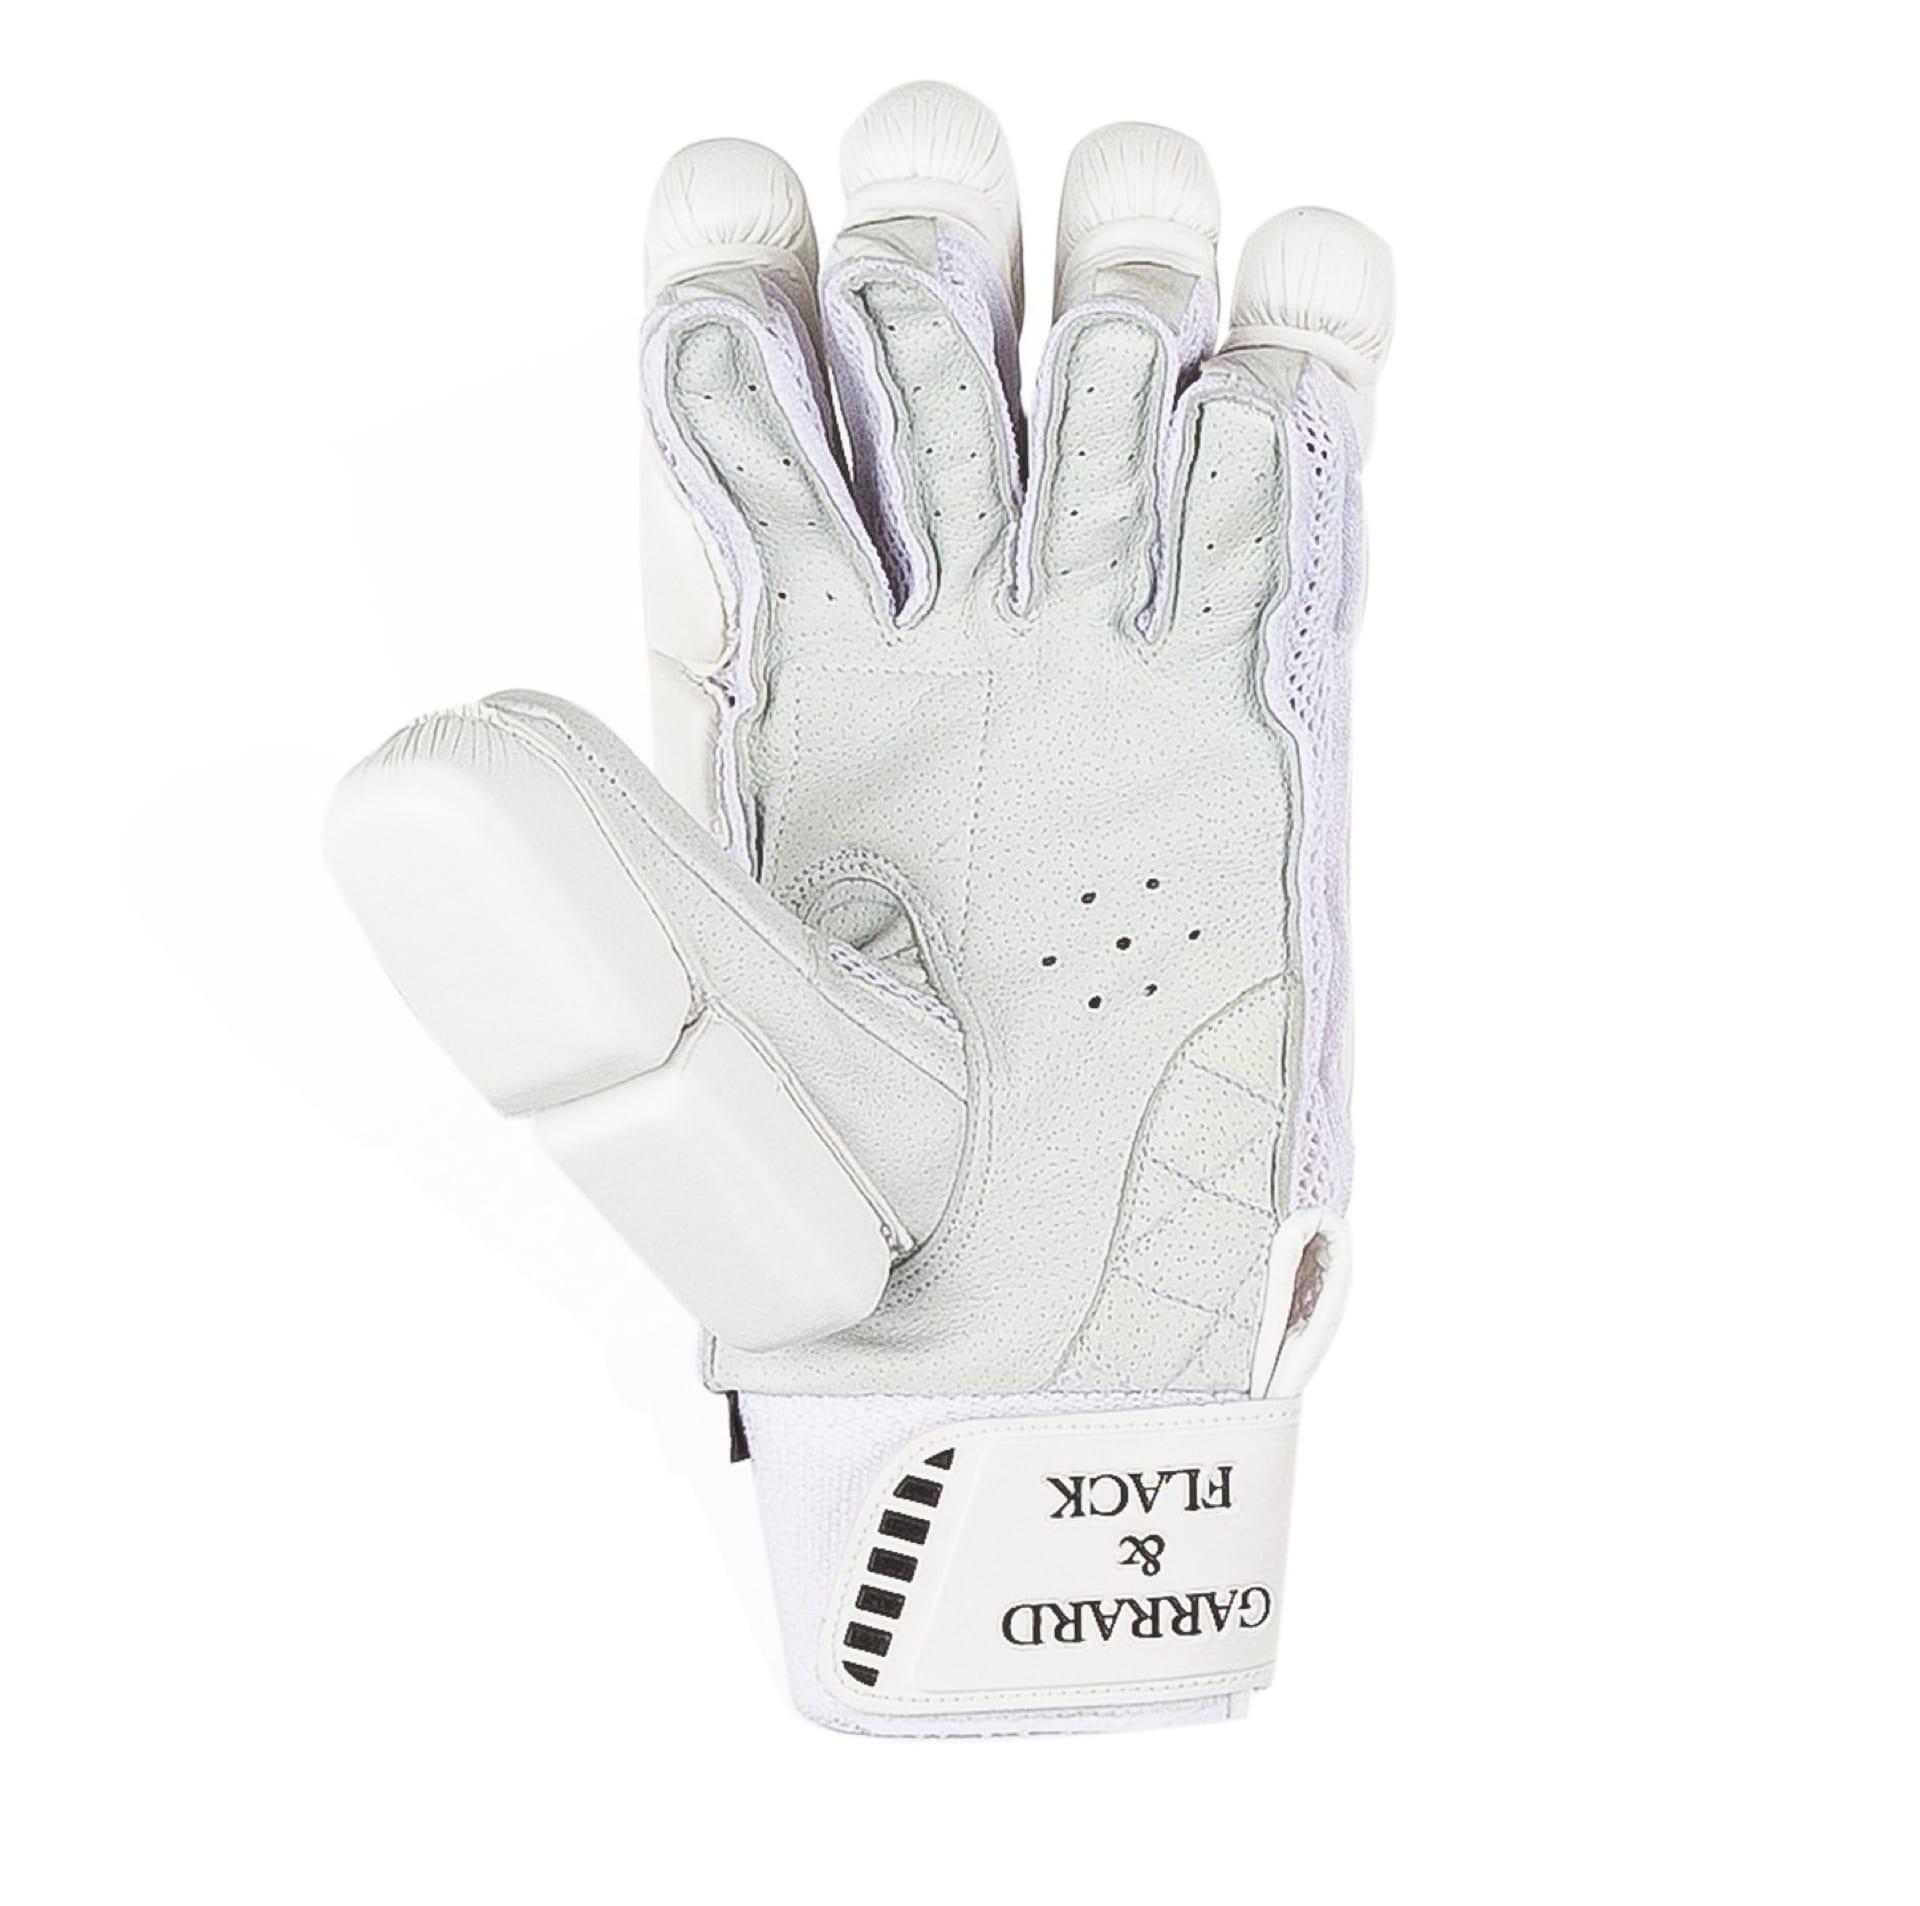 white cricket glove waving at you